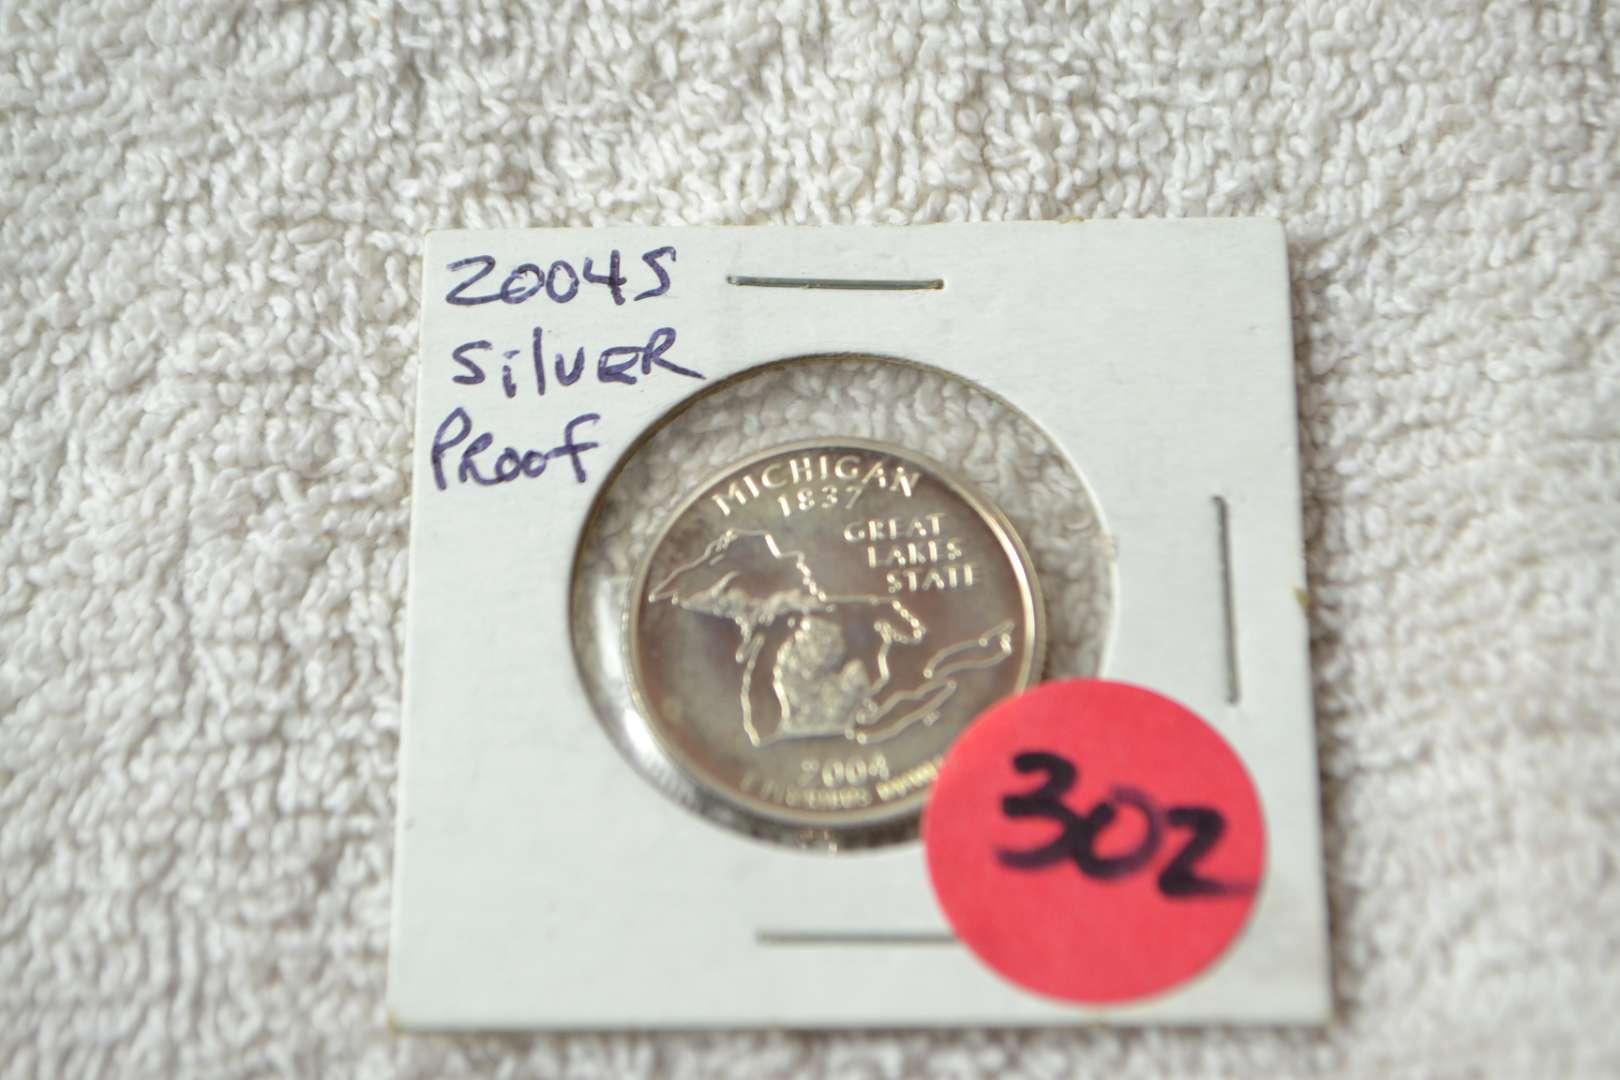 Lot # 302 2004-S SILVER PROOF QUARTER MICHIGAN